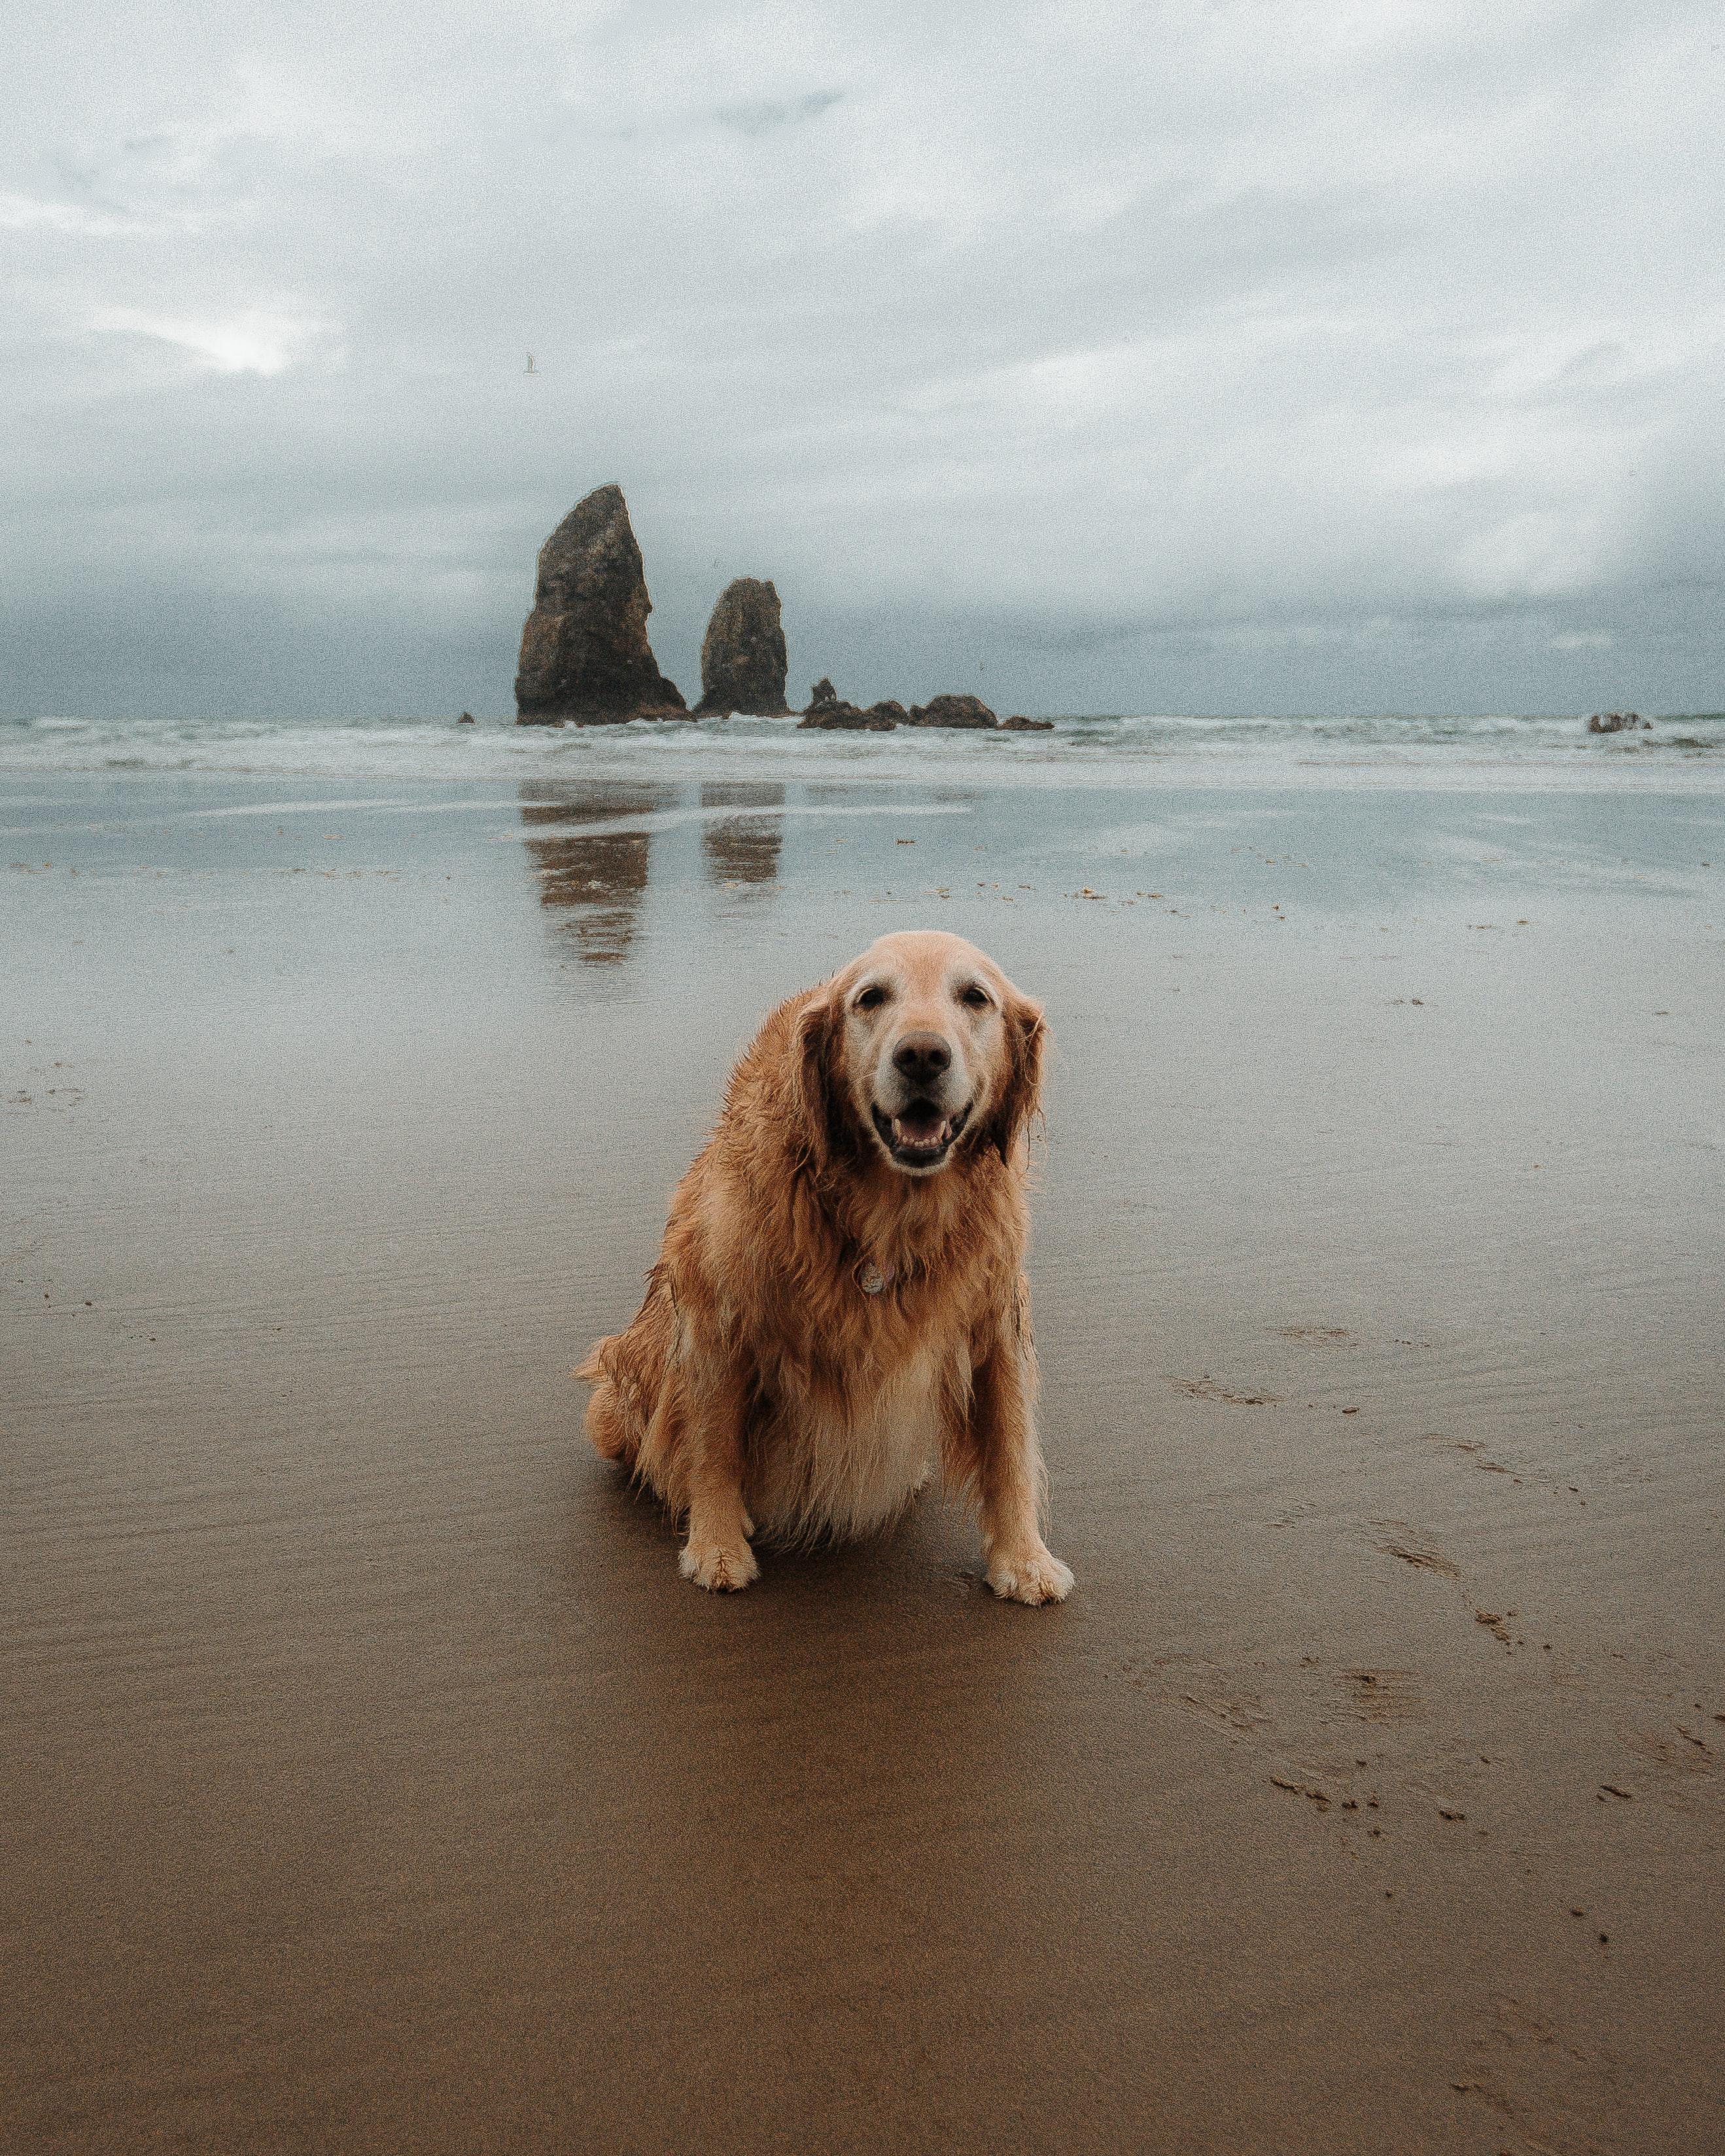 Golden Retriever Sitting On Beach Shore During Daytime Photo Free Dog Image On Unsplash